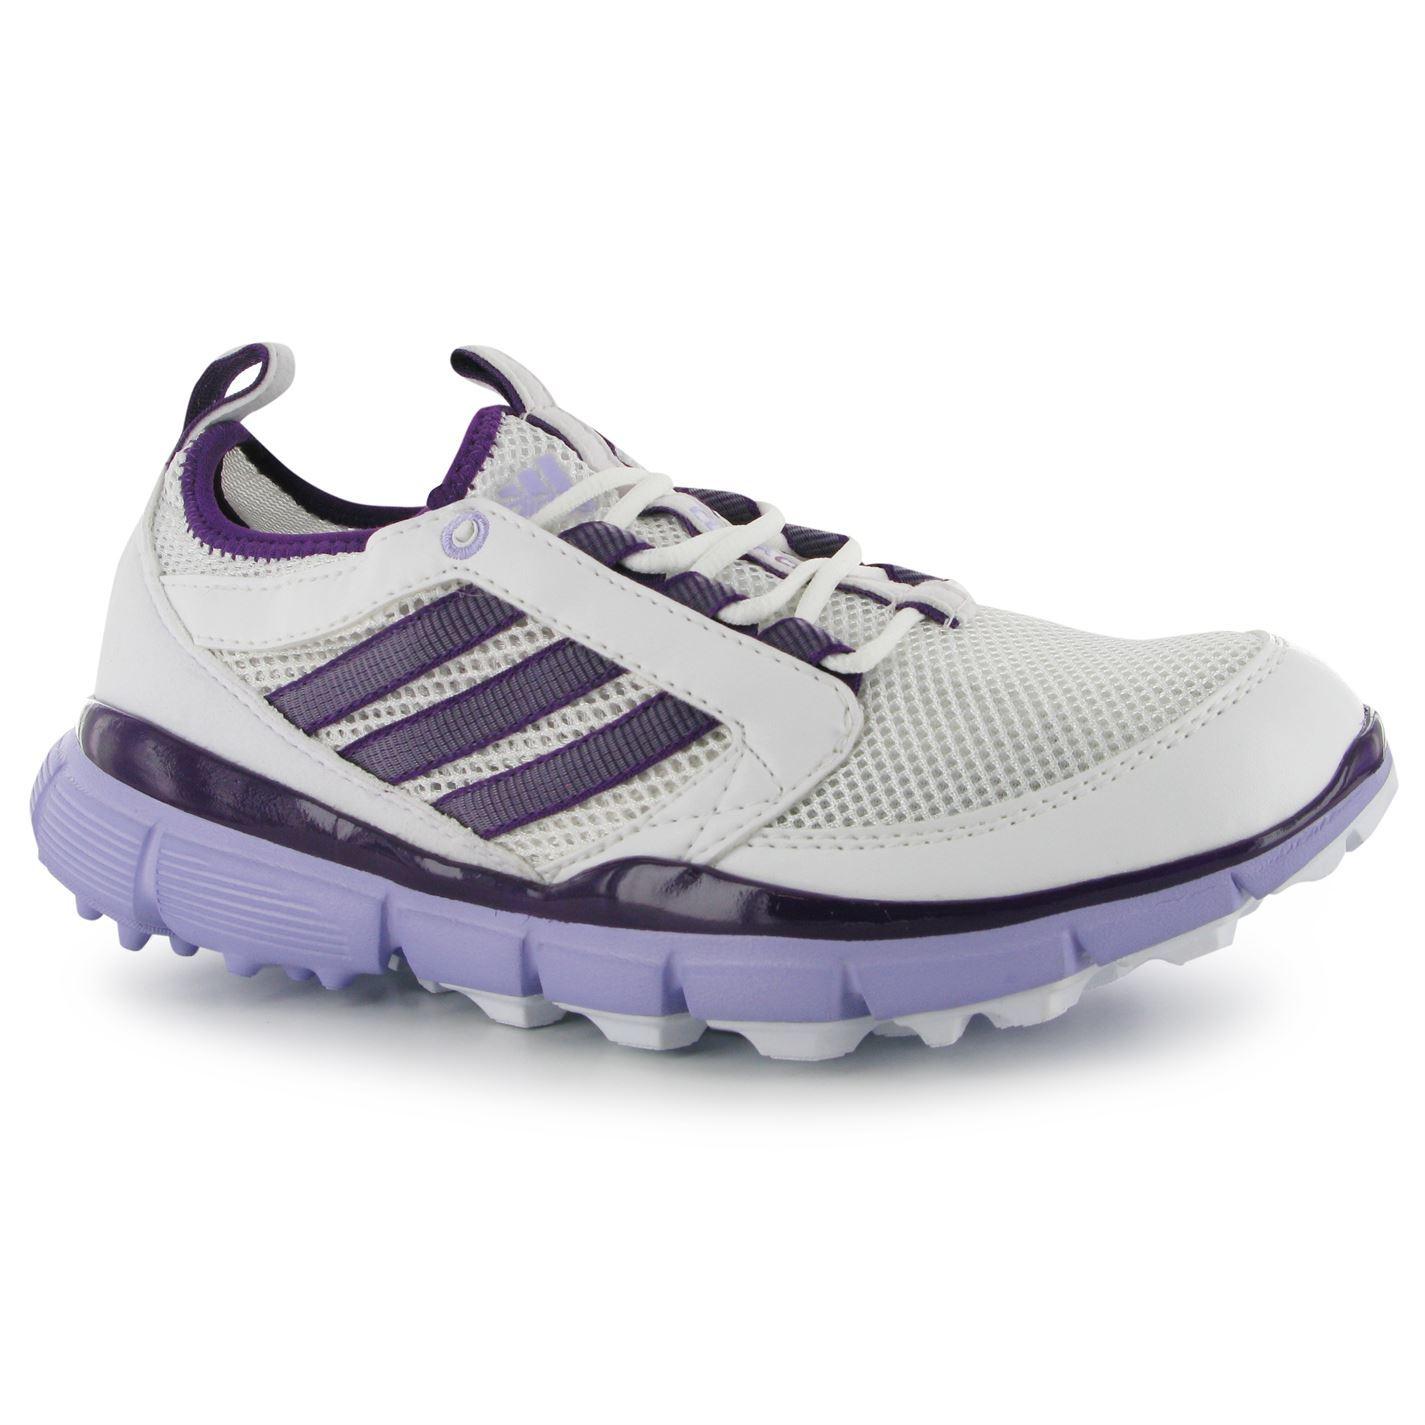 adidas adistar climacool golf shoes womens white purple ebay